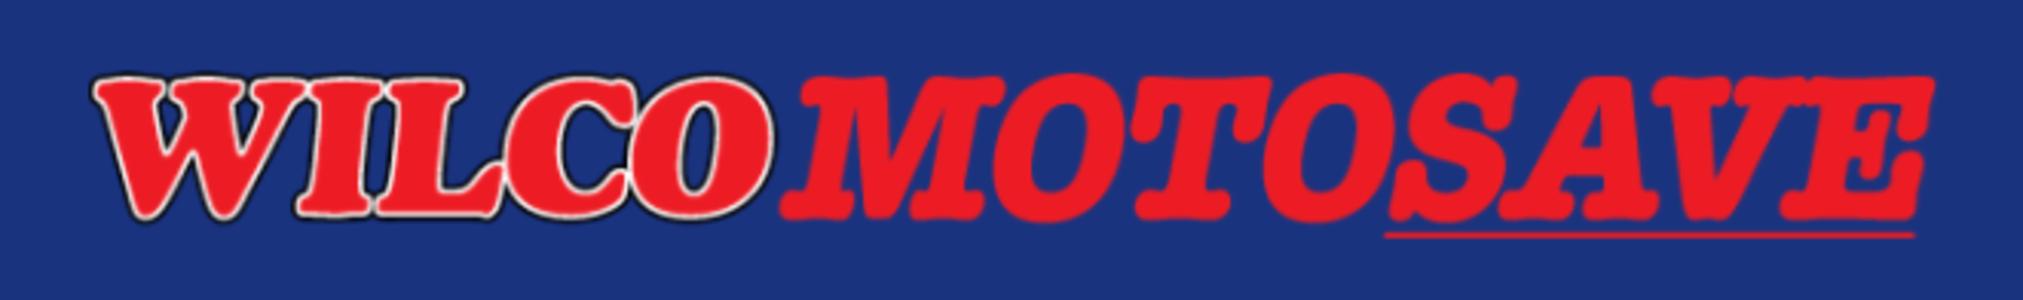 Wilco Motosave - York